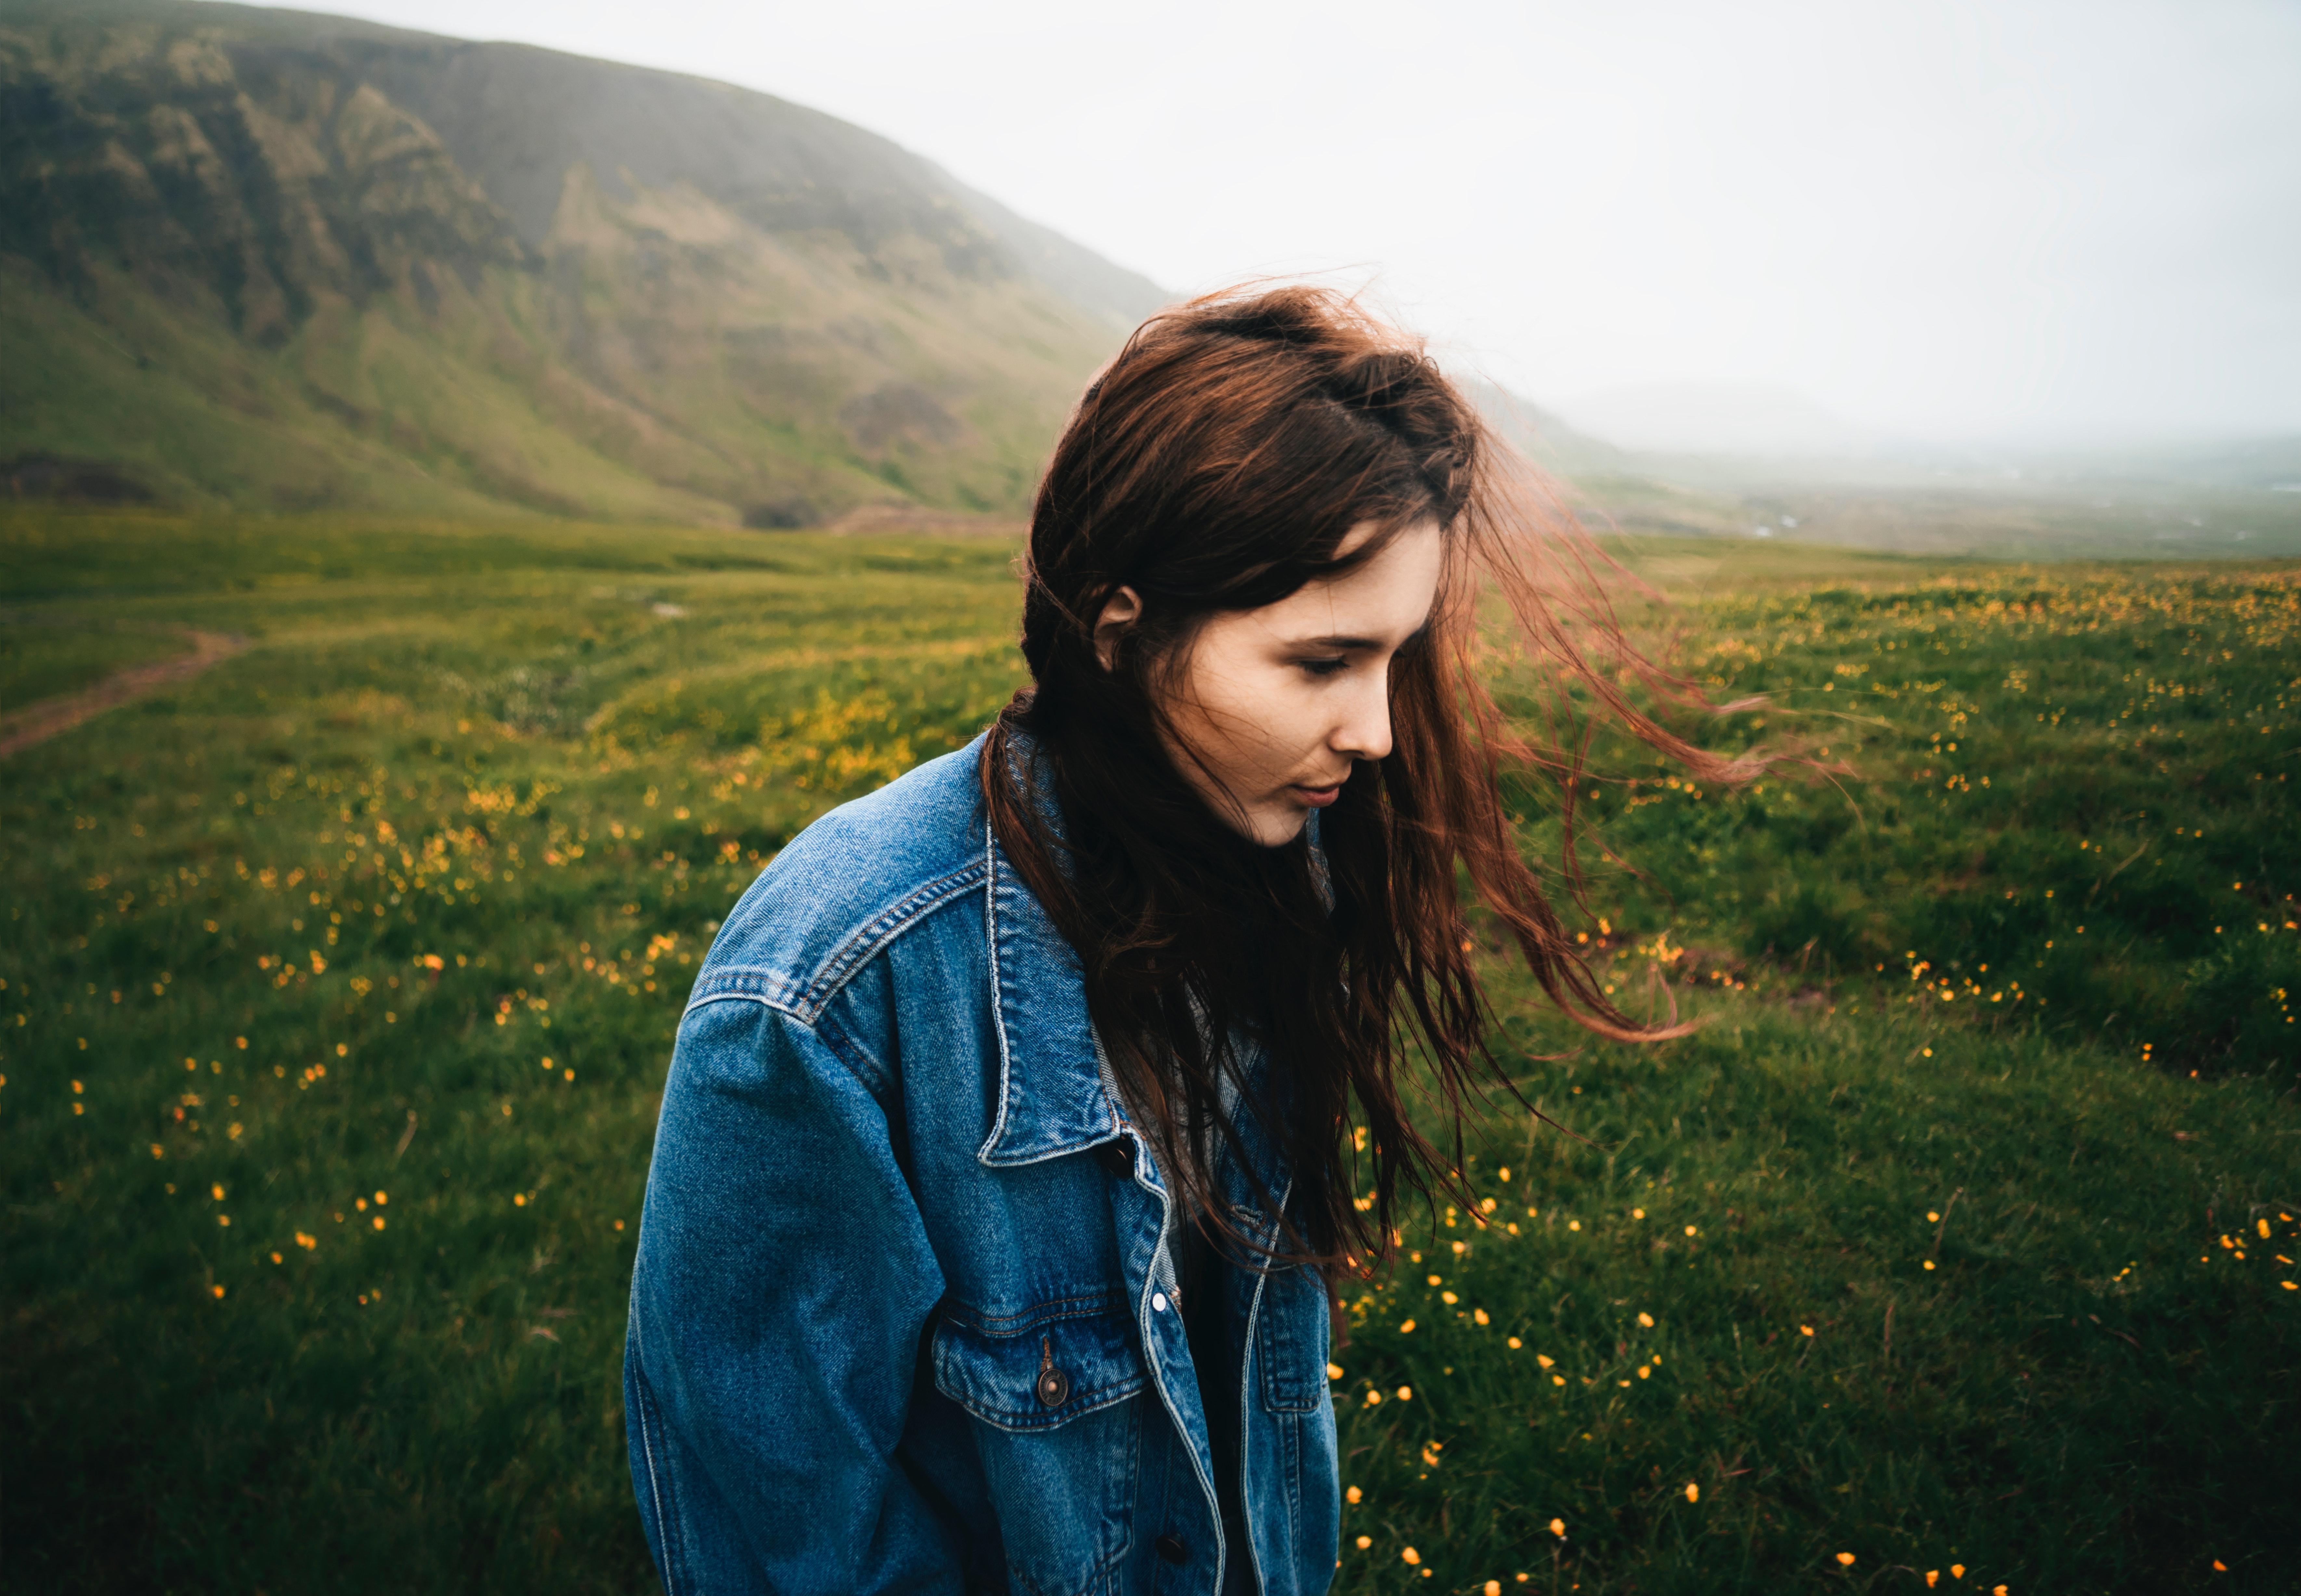 Woman Wearing Blue Denim Jacket Walking on the Green Grass Field, Beautiful, Jacket, Pretty, Photoshoot, HQ Photo